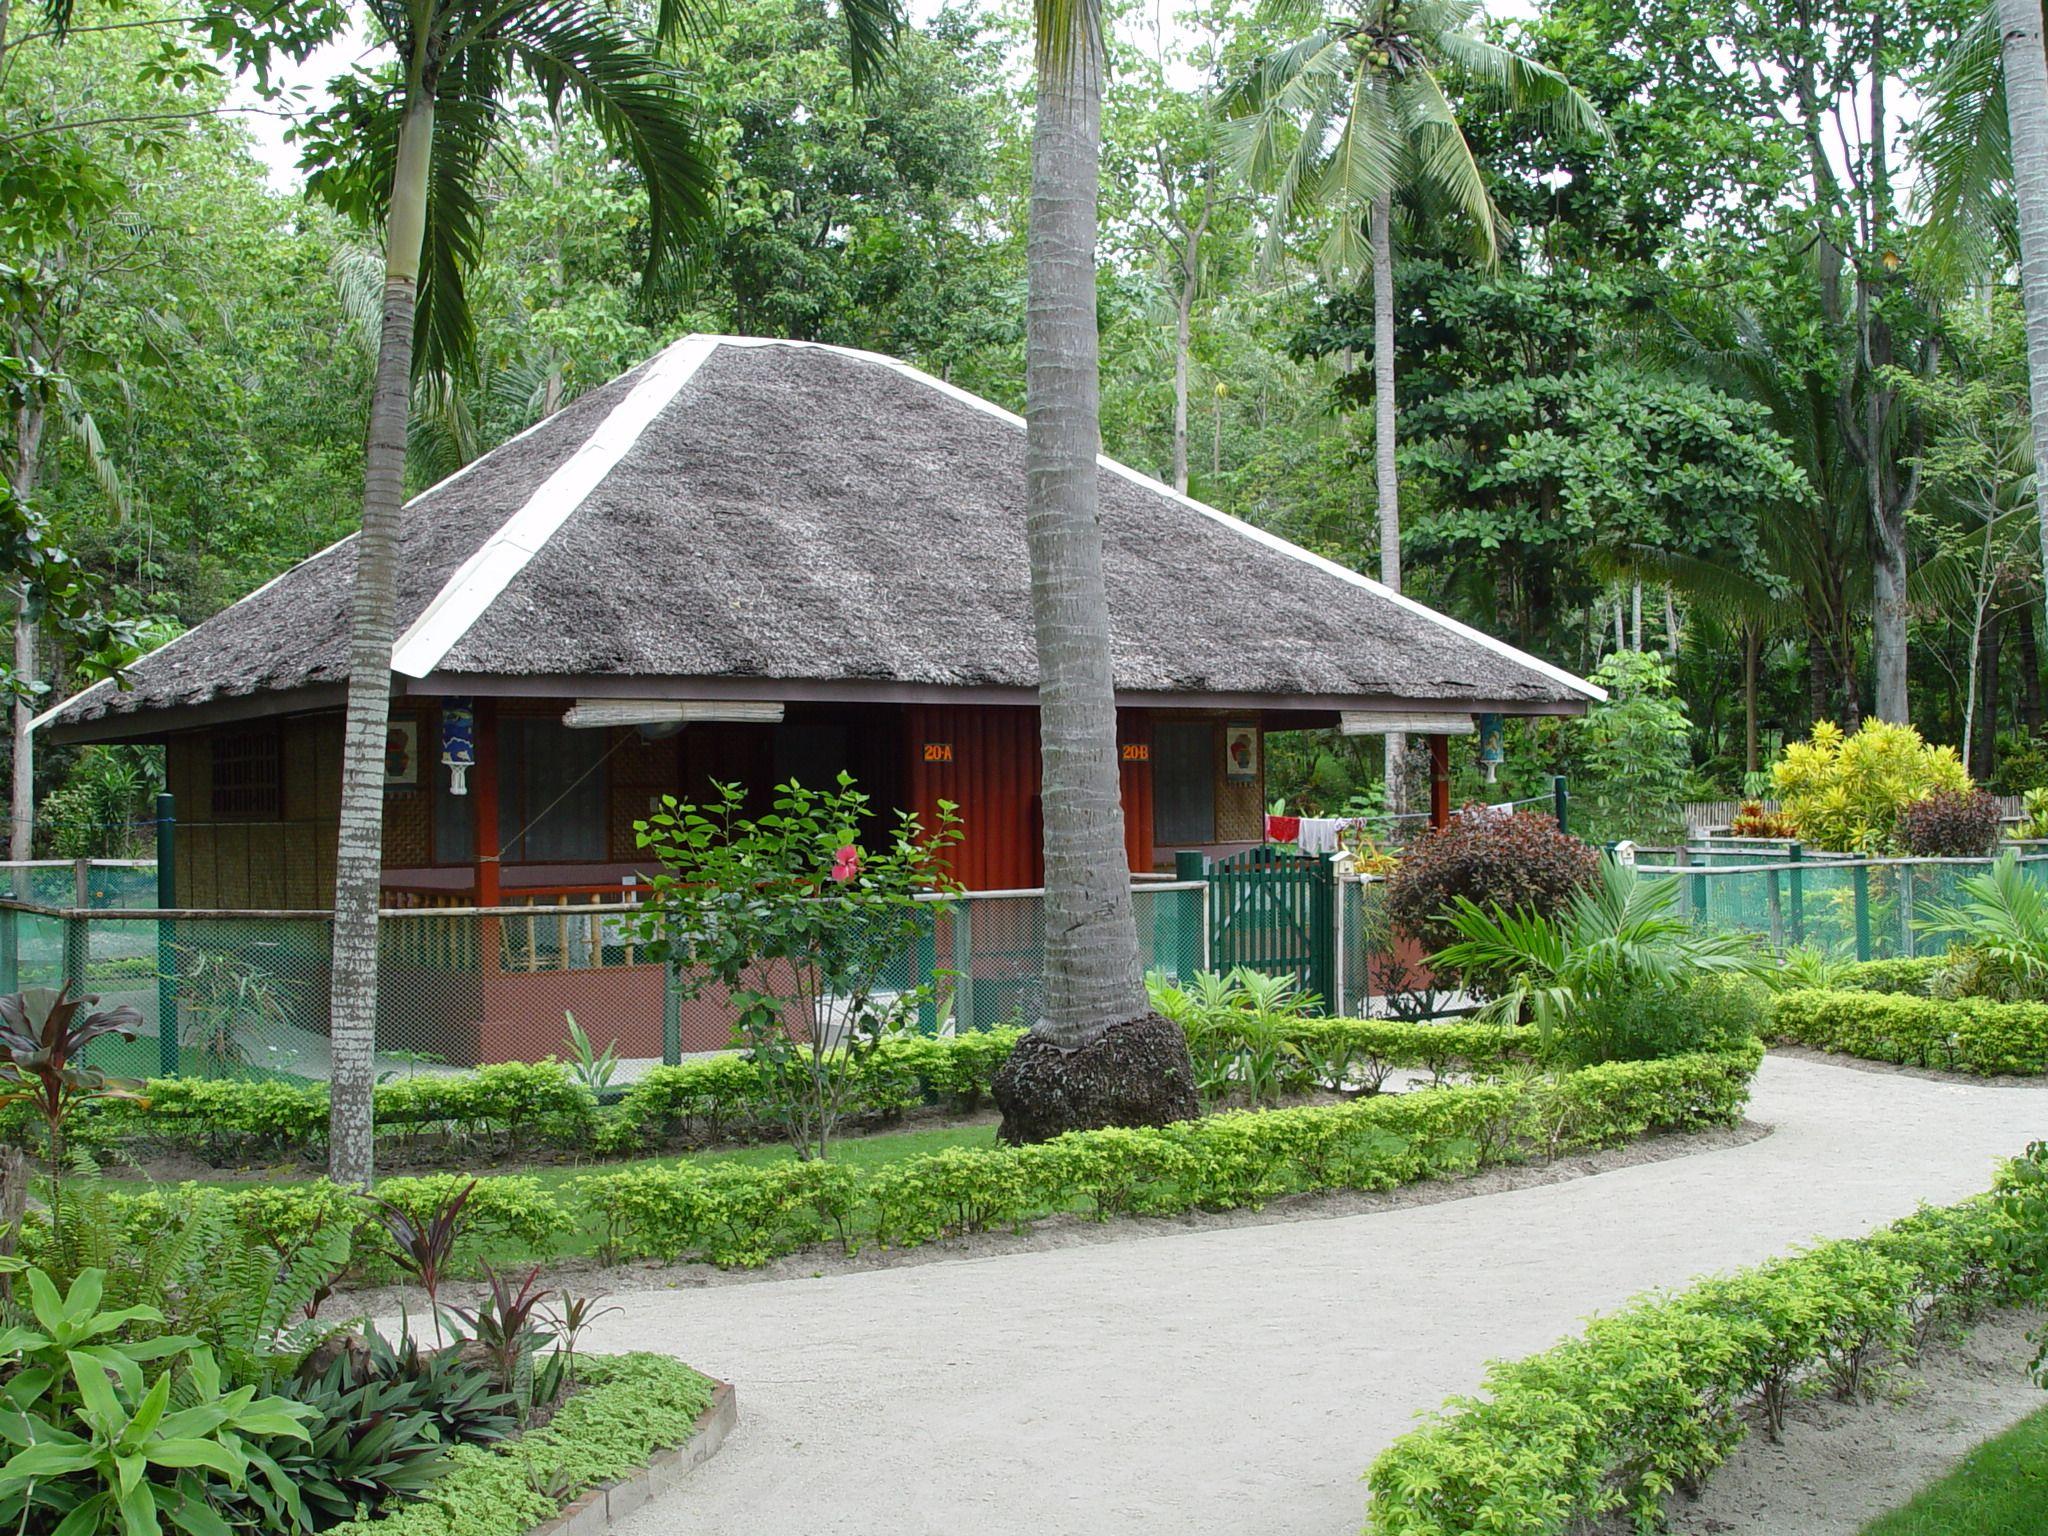 Modern native house design philippines plans modern native house - House Modern Bahay Kubo Design